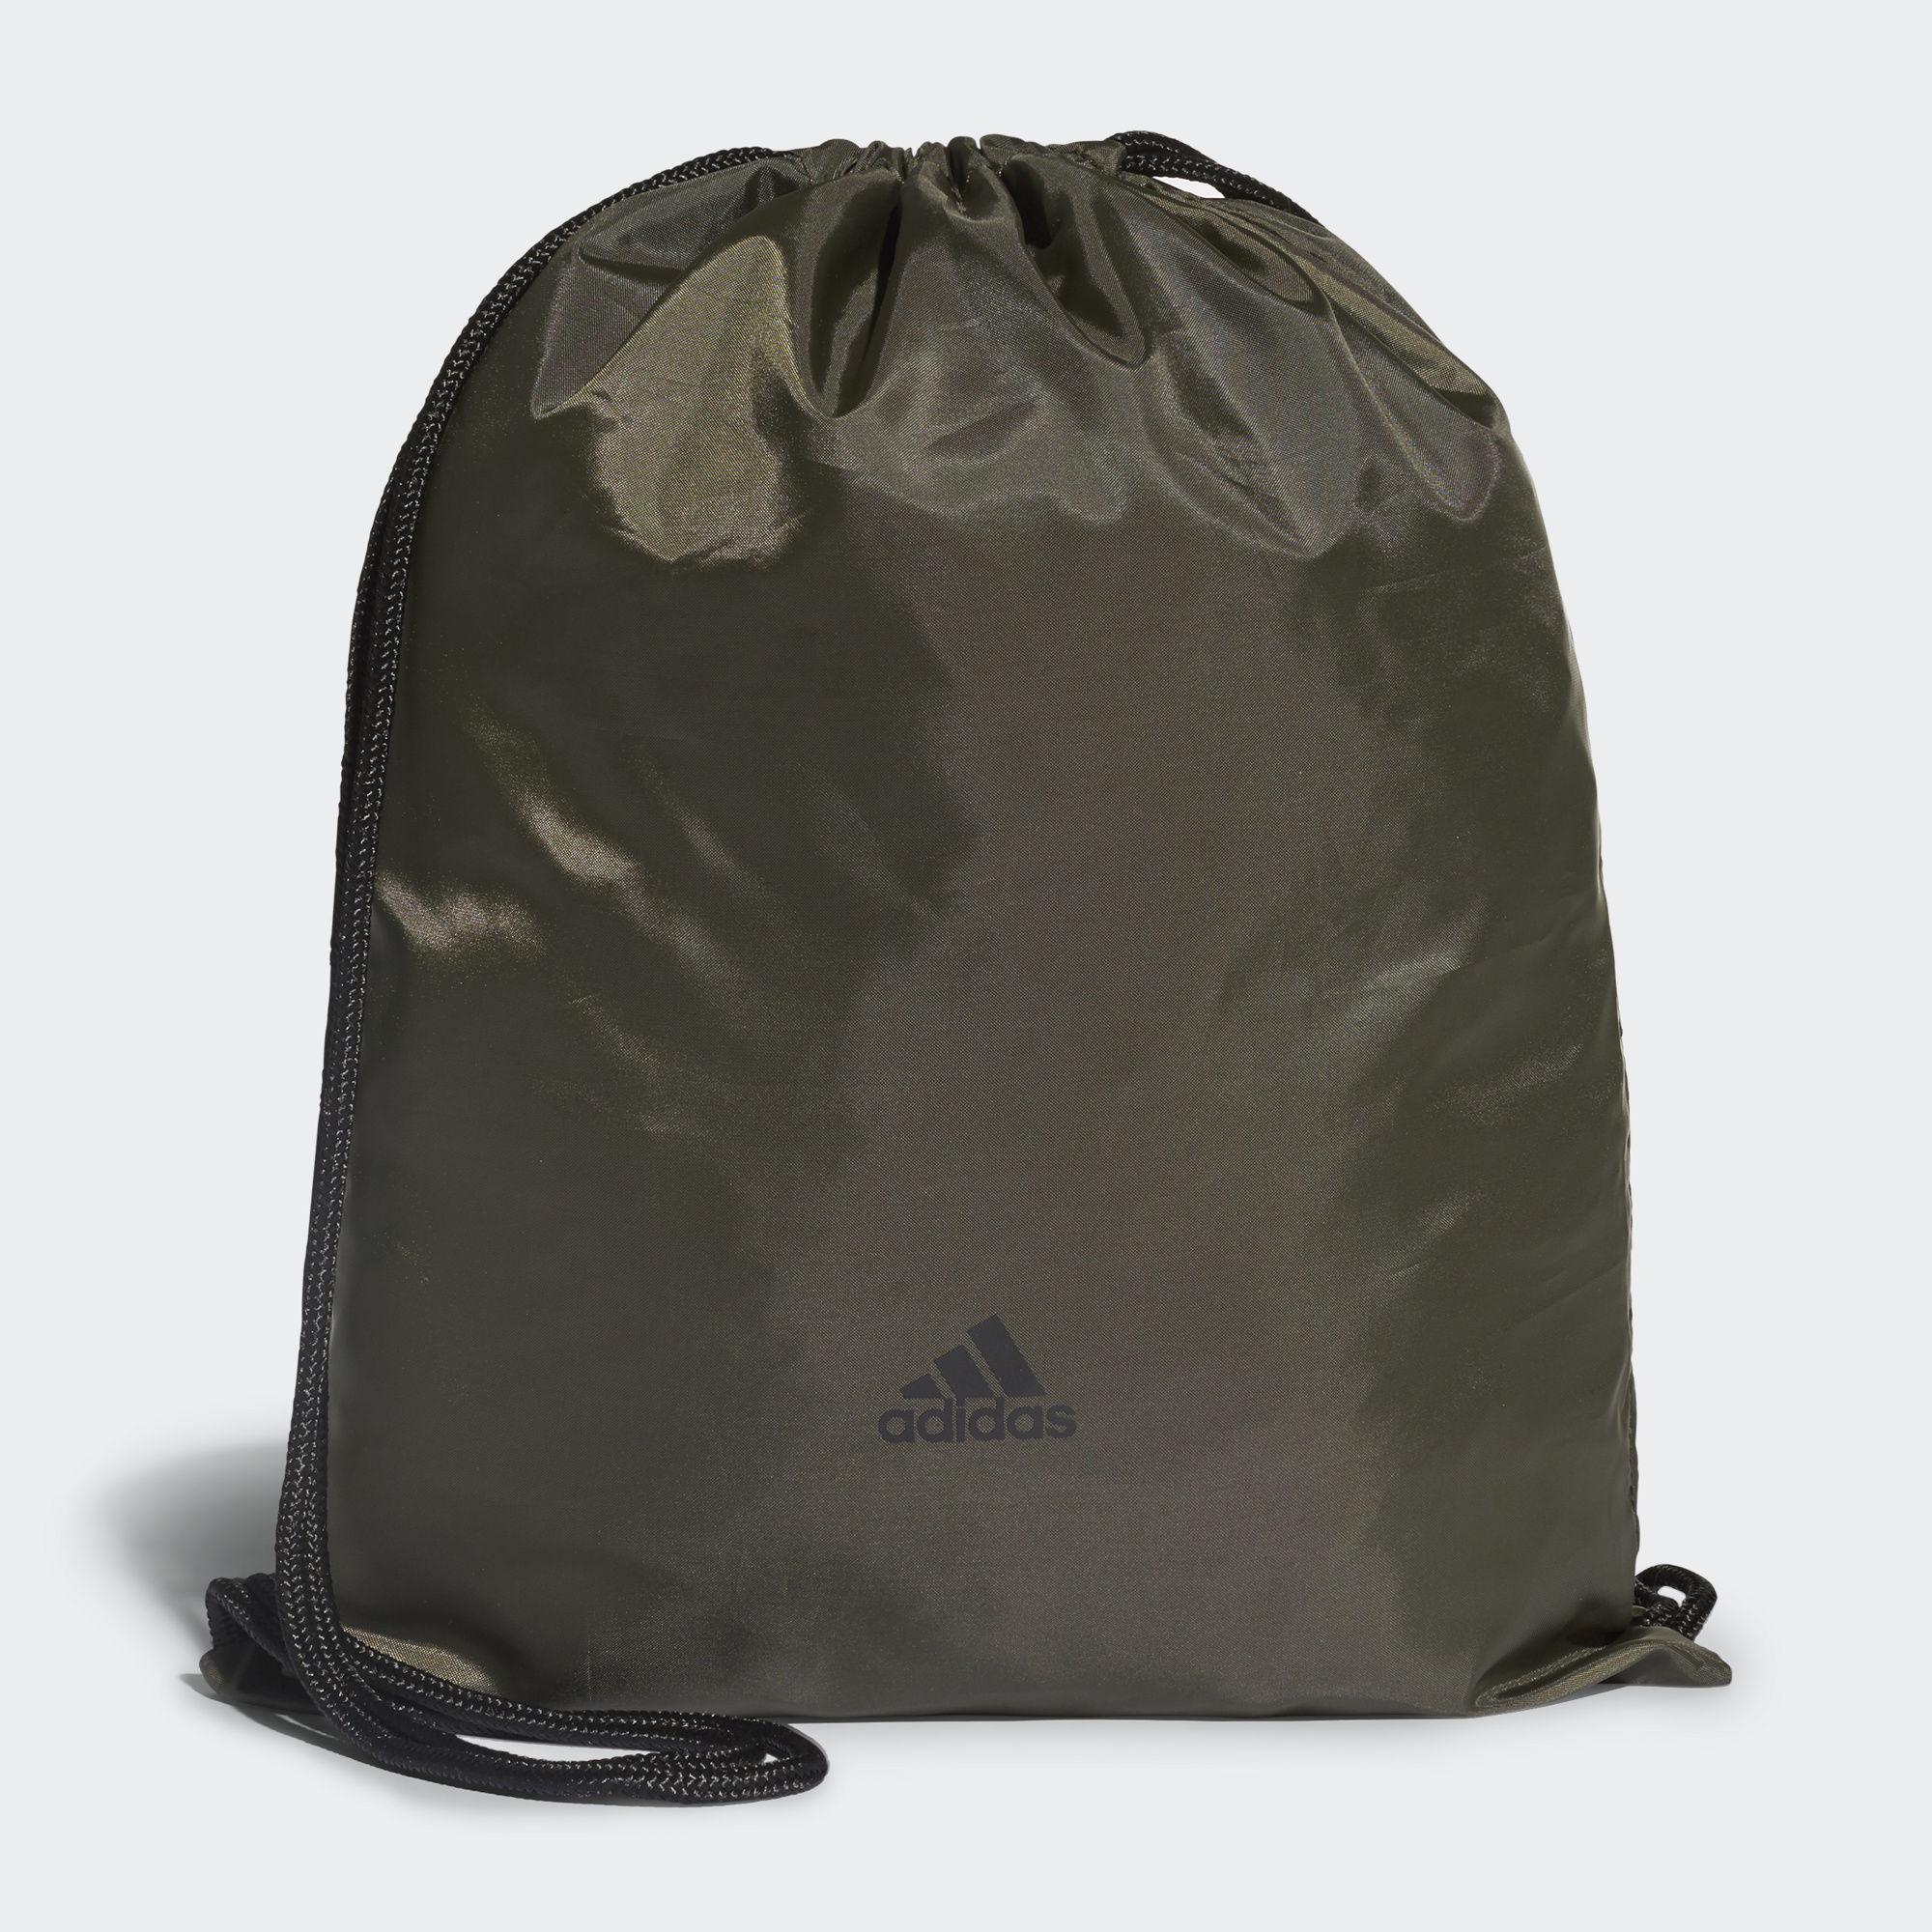 147b76285e Adidas - Multicolor Football Street Gym Bag for Men - Lyst. View fullscreen